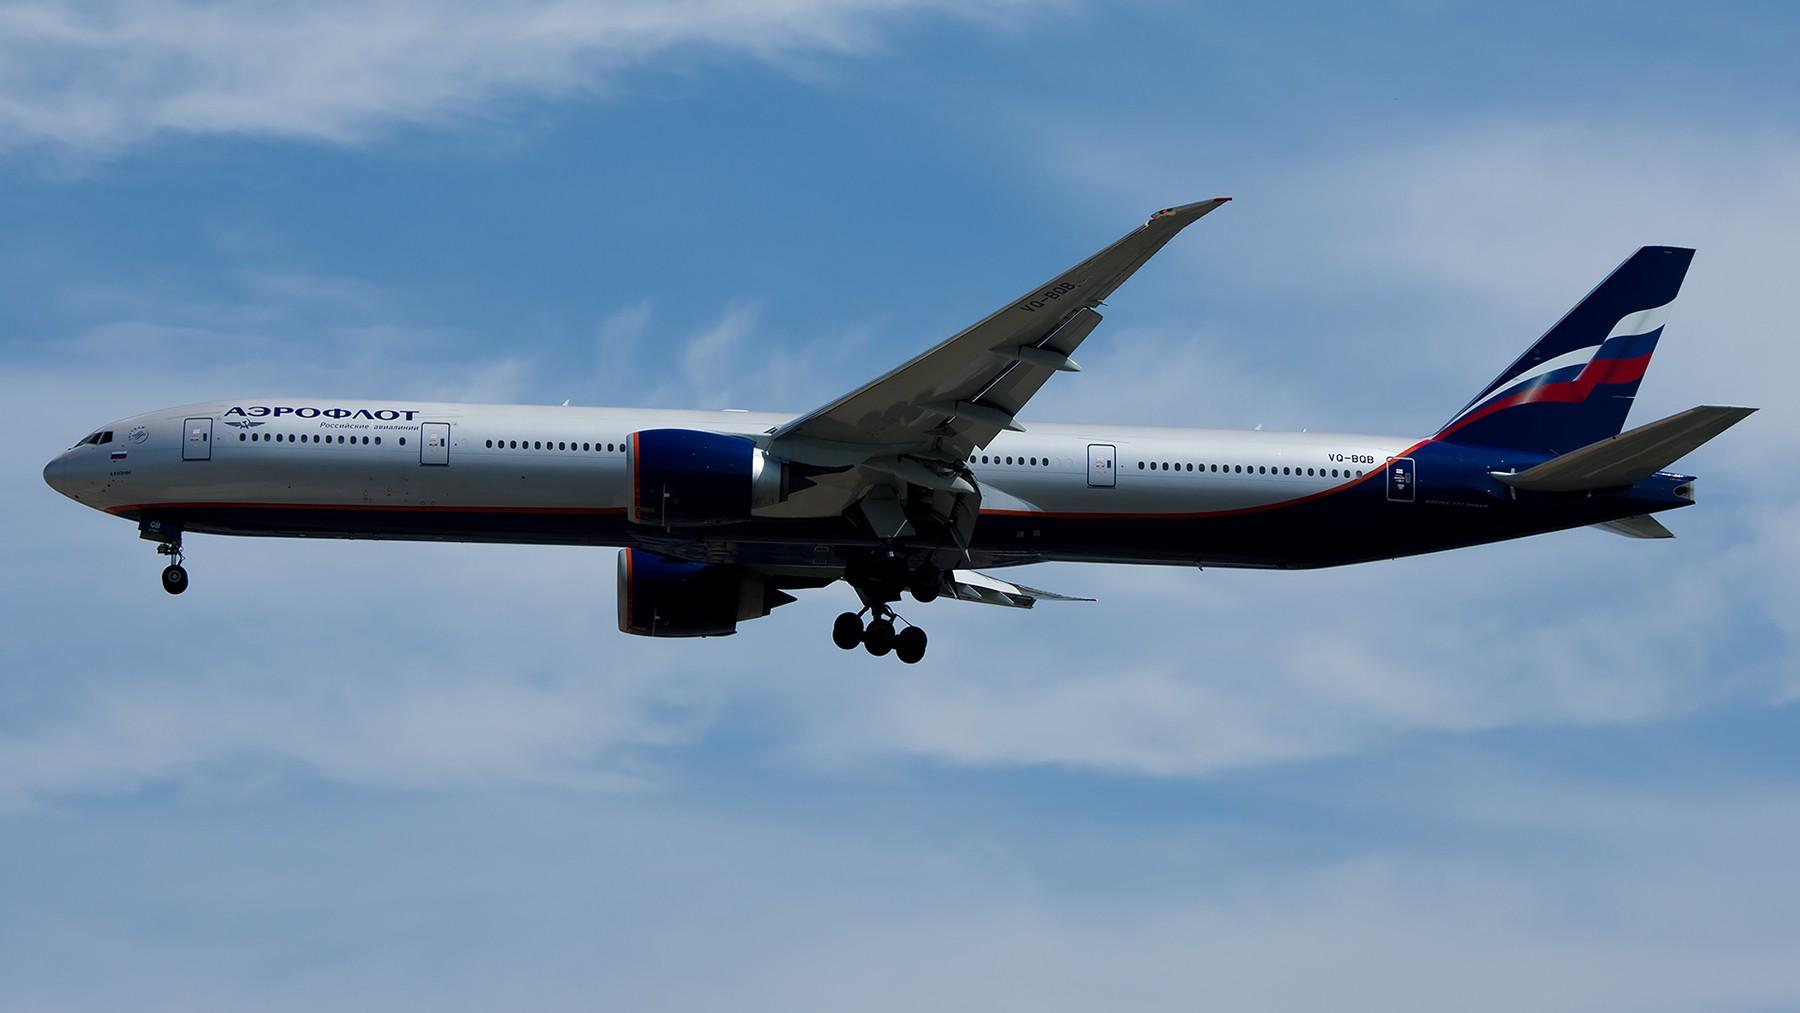 Re:[原创]终于放假了,出来冒个泡,随便发几张 BOEING 777-300ER VQ-BQB 中国北京首都国际机场